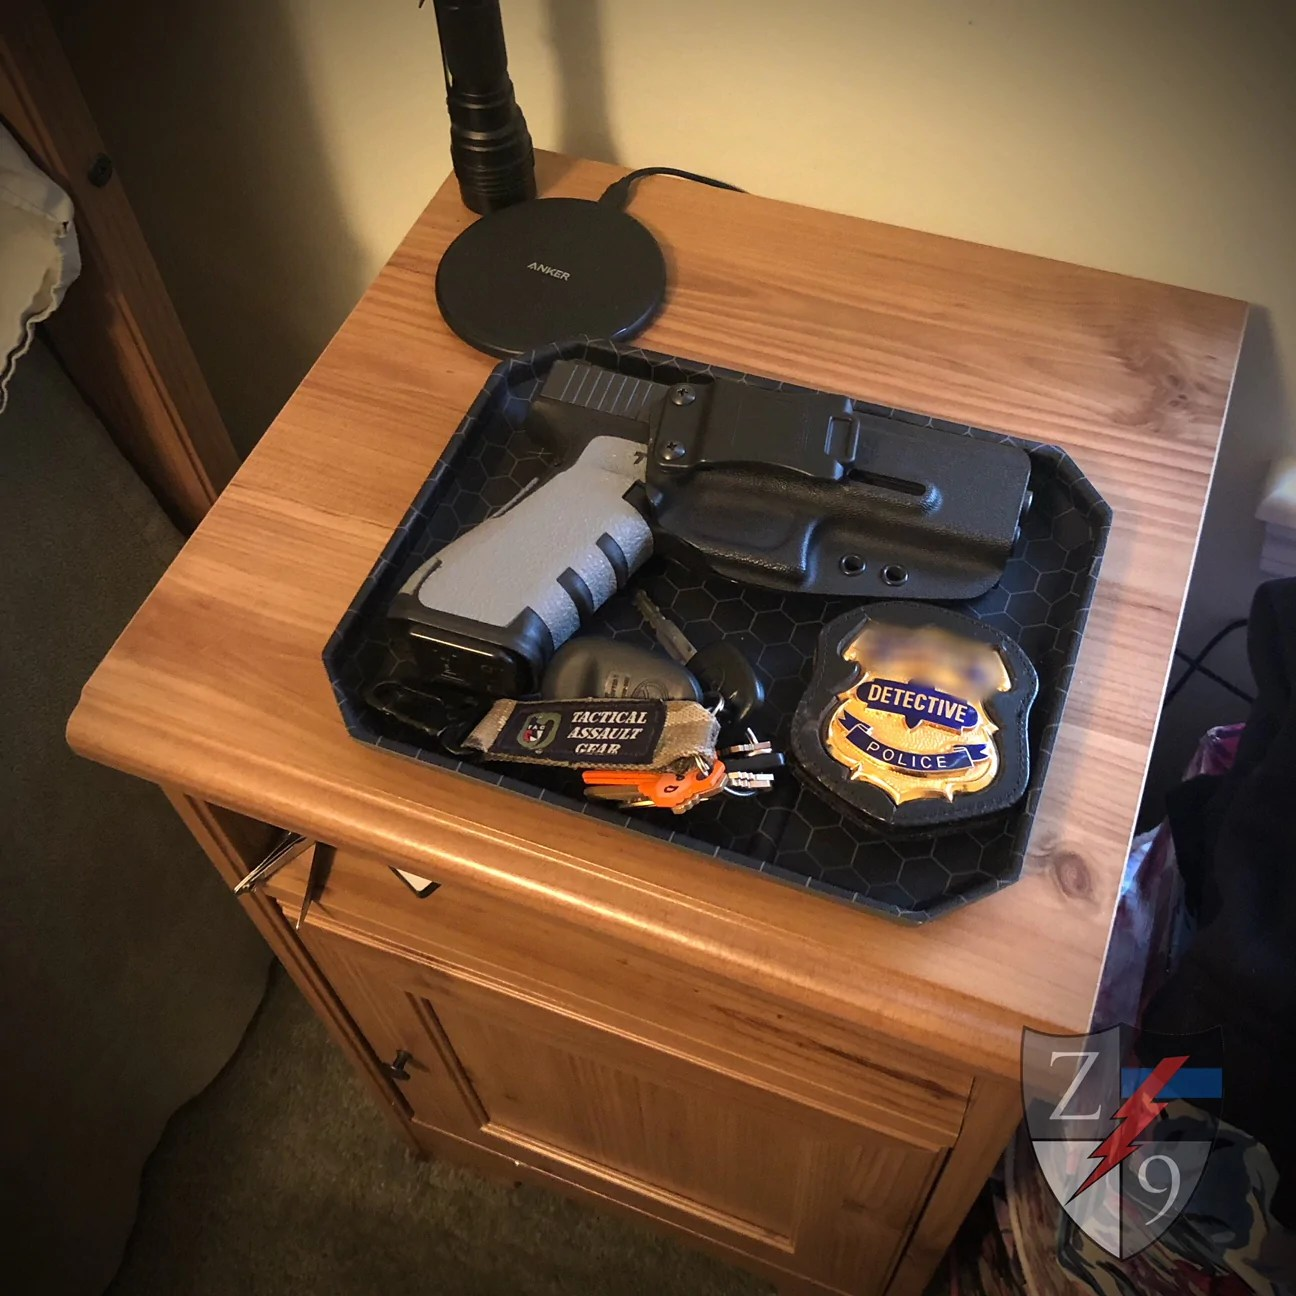 edc dump tray zero9